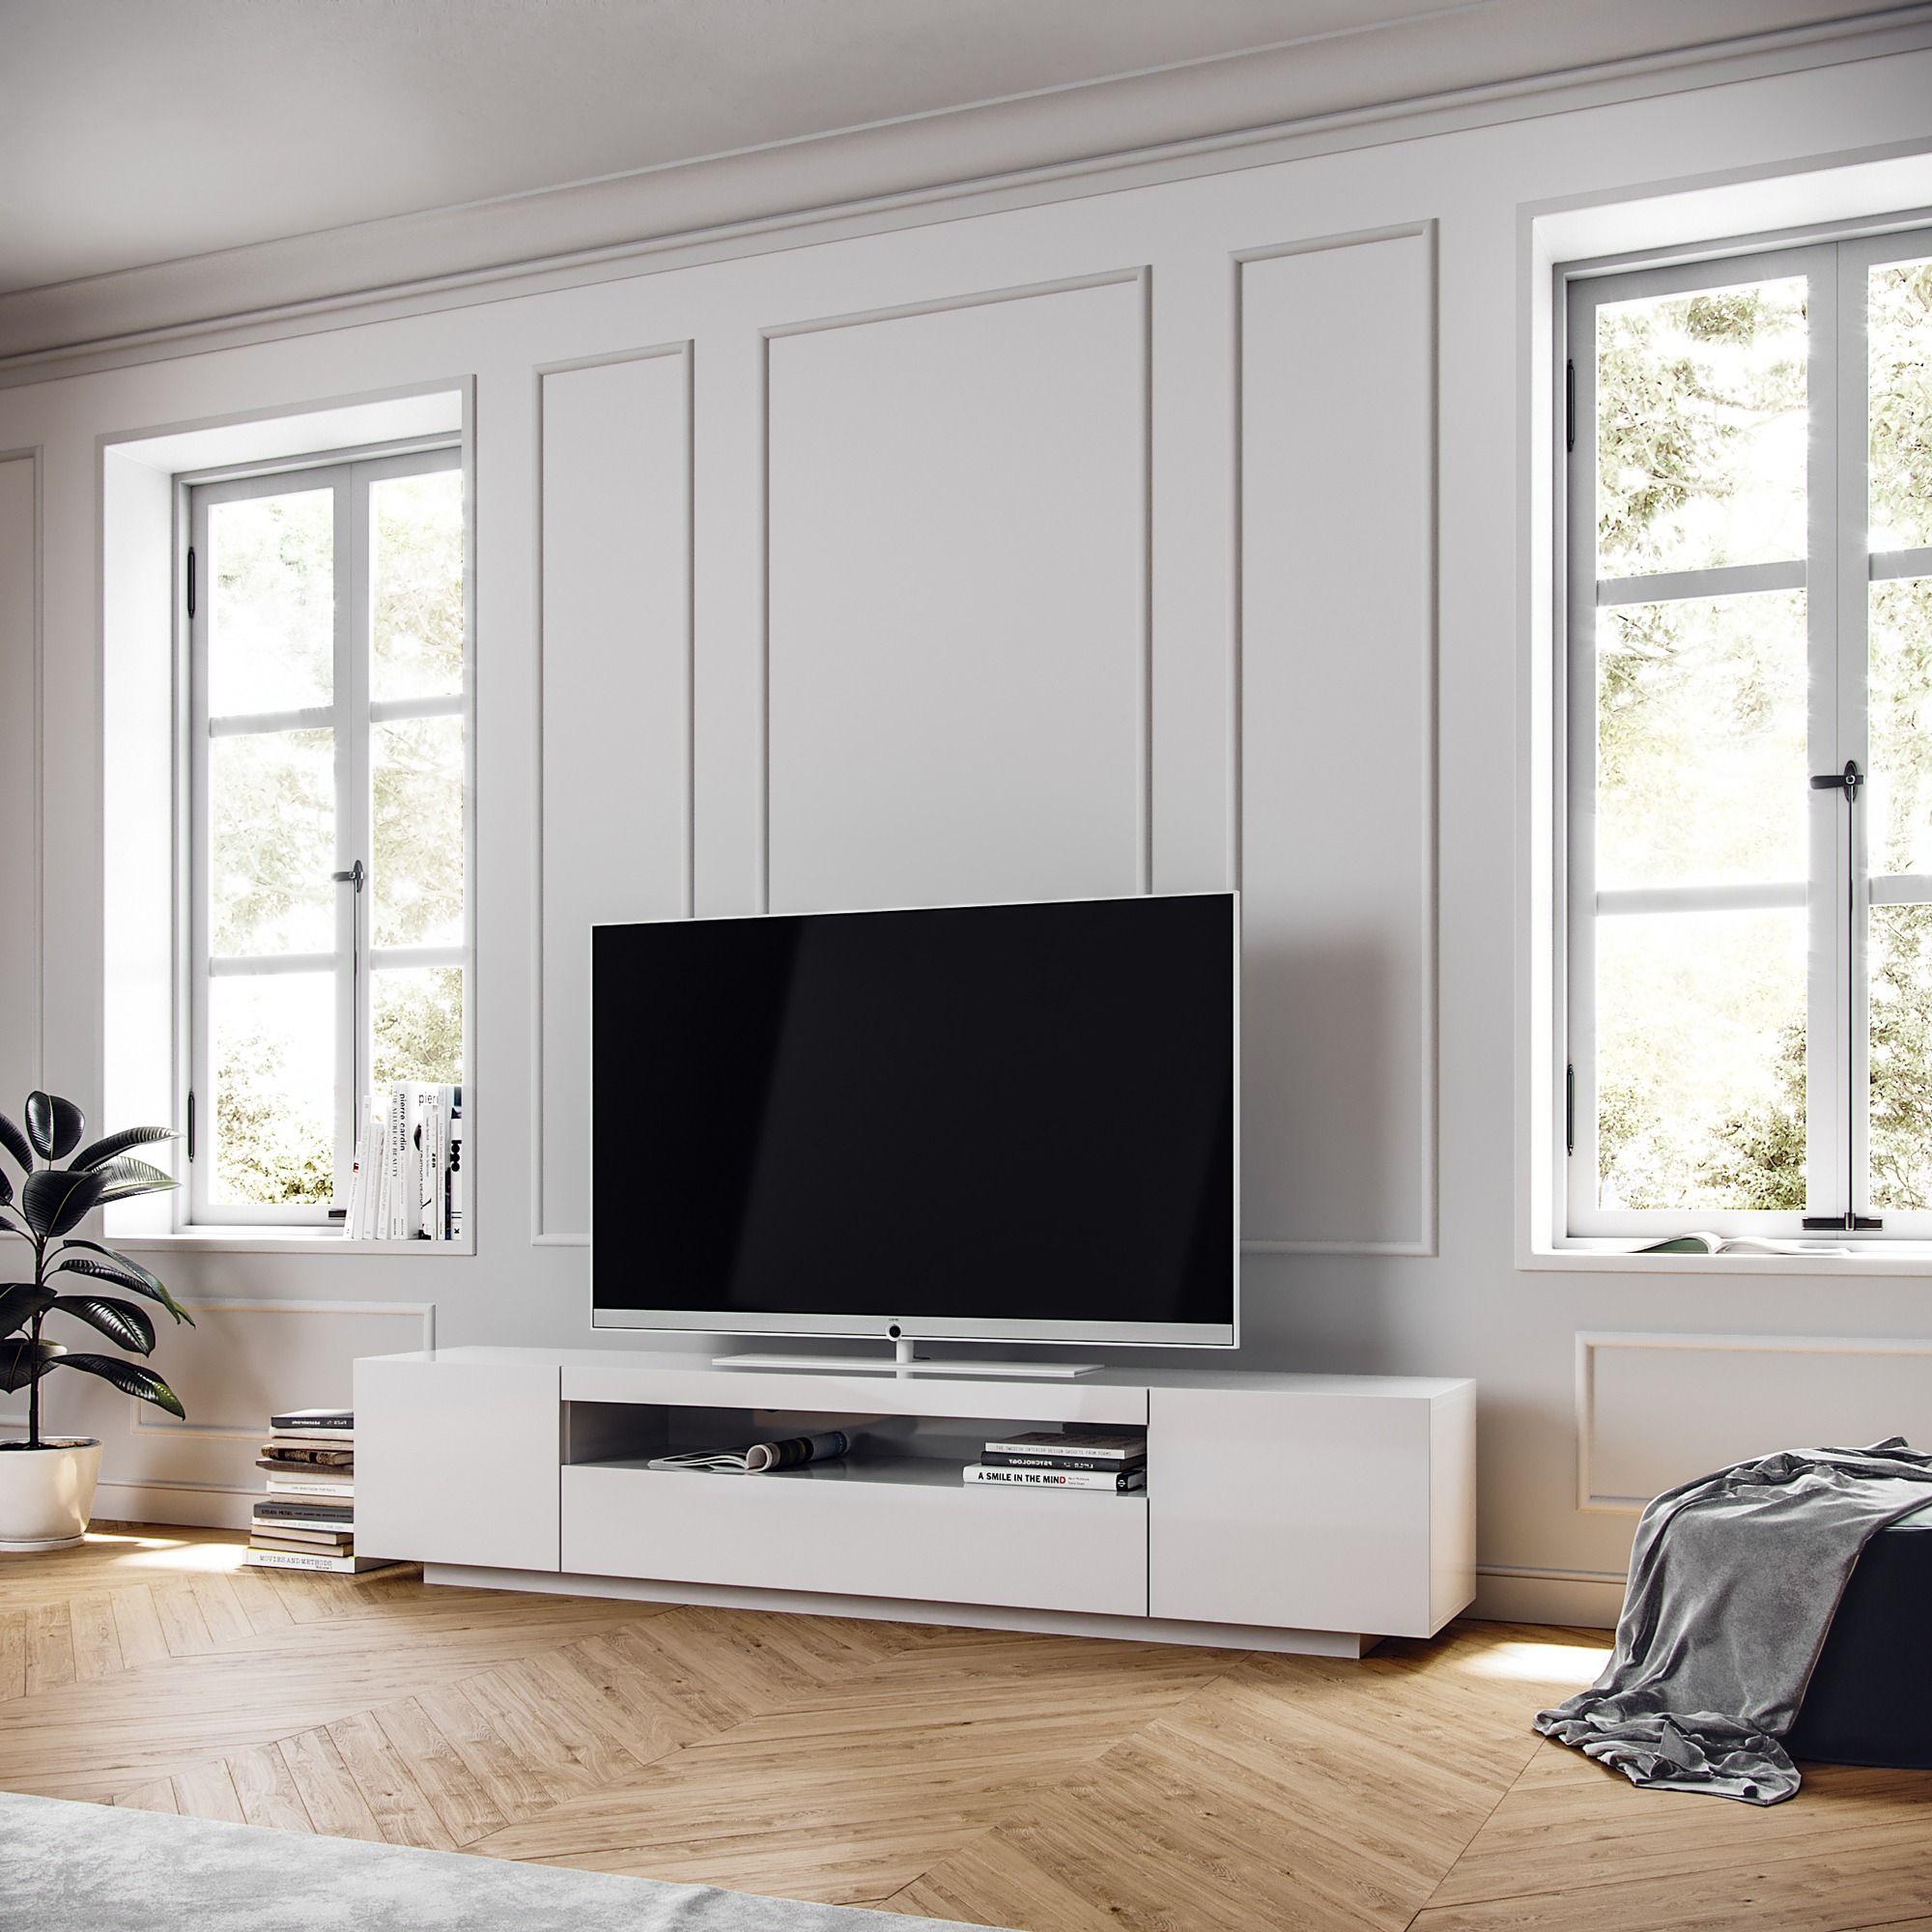 Samso Minimalist Tv Cabinet Modern Tv Cabinet Closed Storage Cabinets Loft Design